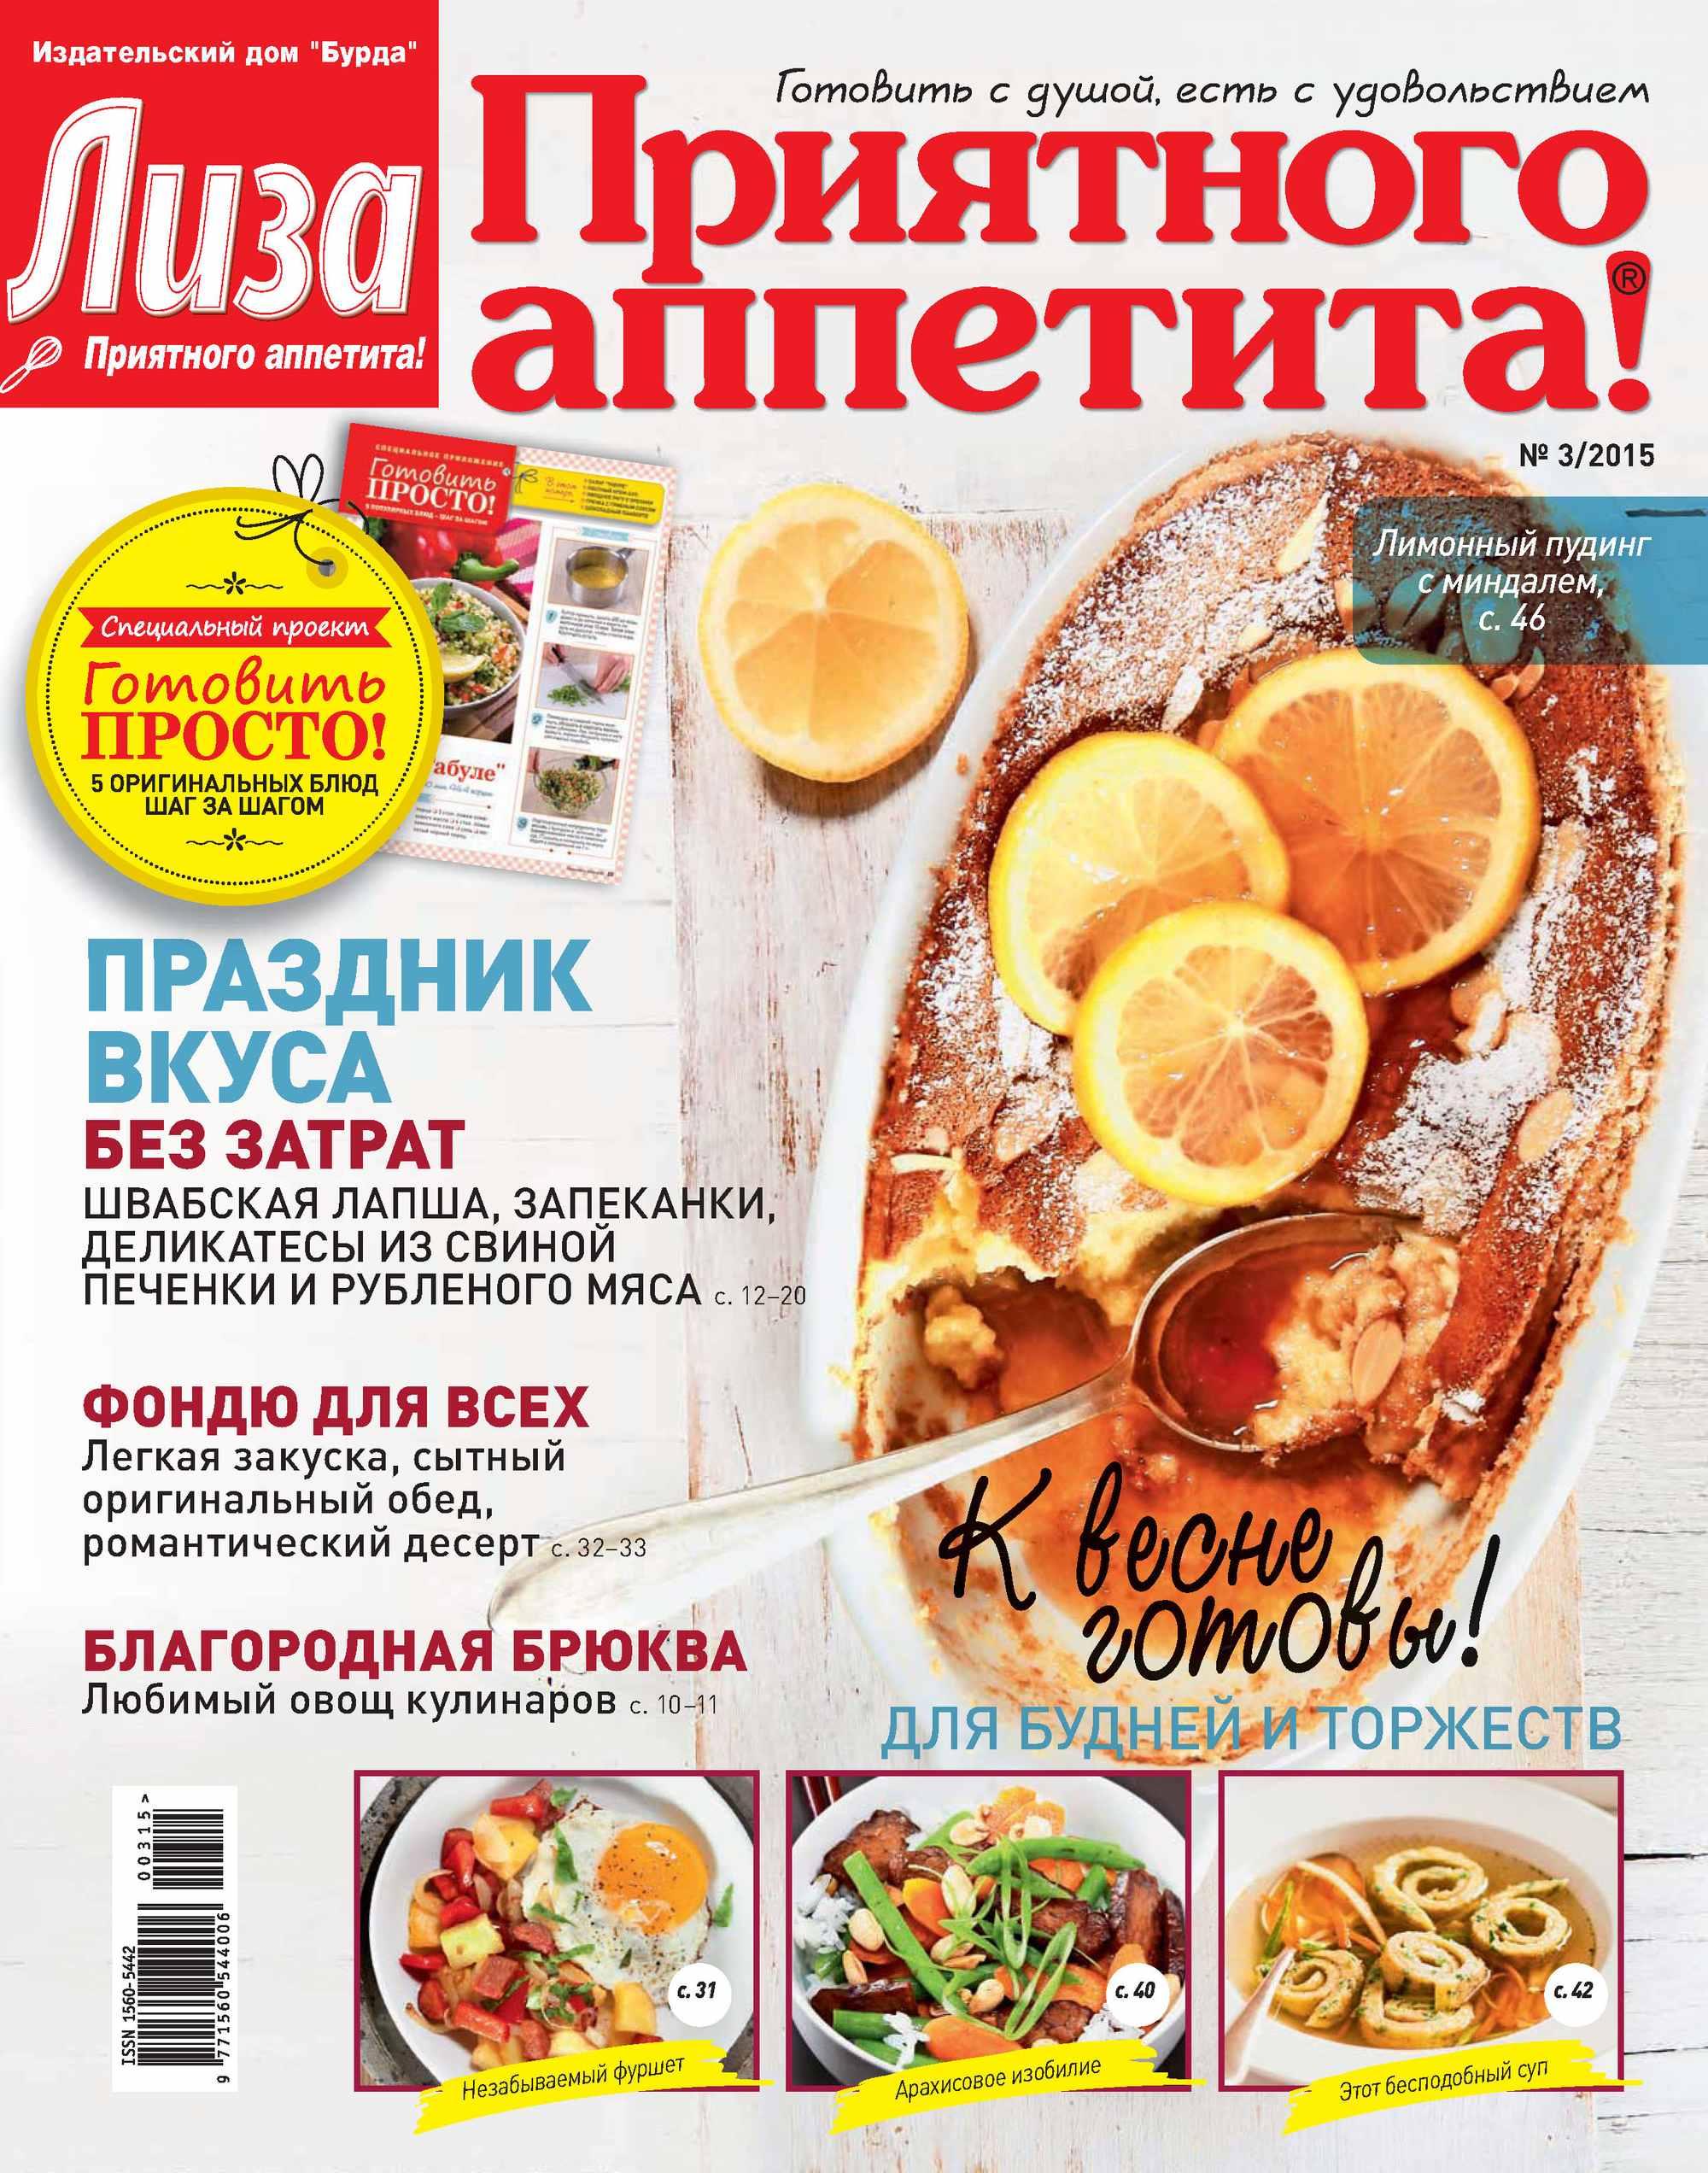 ИД «Бурда» Журнал «Лиза. Приятного аппетита» №03/2015 ид бурда журнал лиза приятного аппетита 04 2015